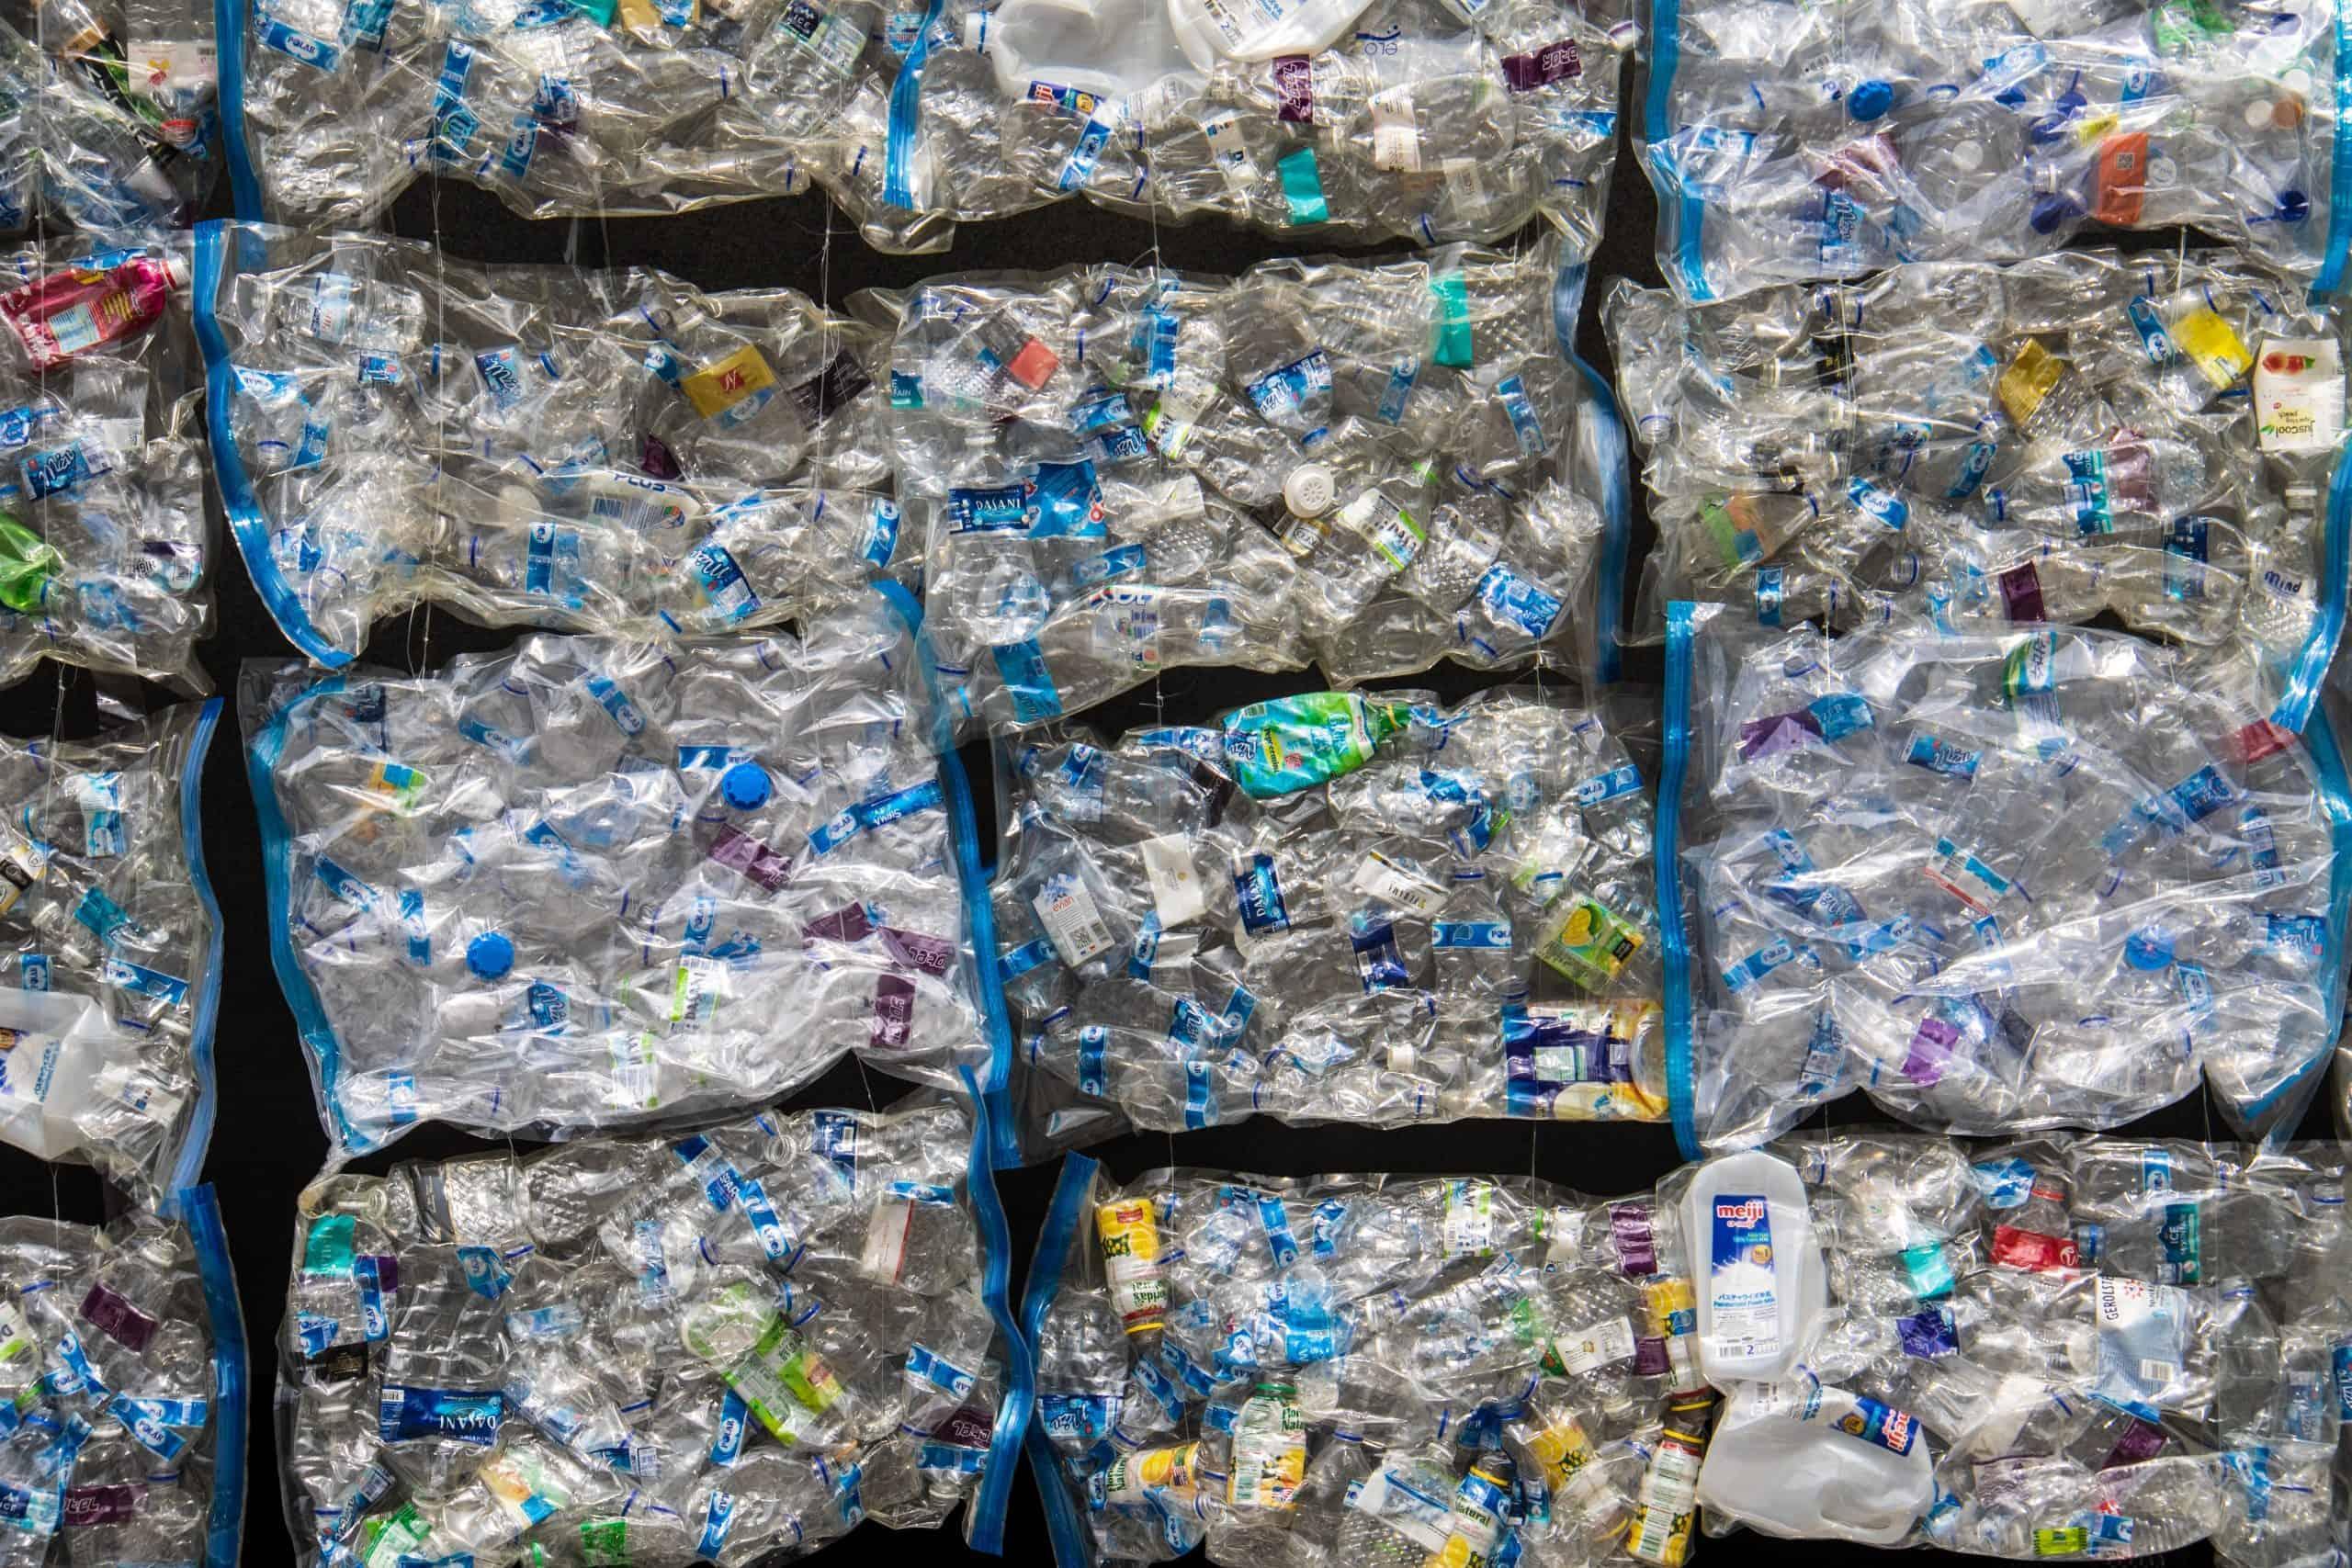 Mannheimer Medizintechnikunternehmen entwickelt Bioplastik